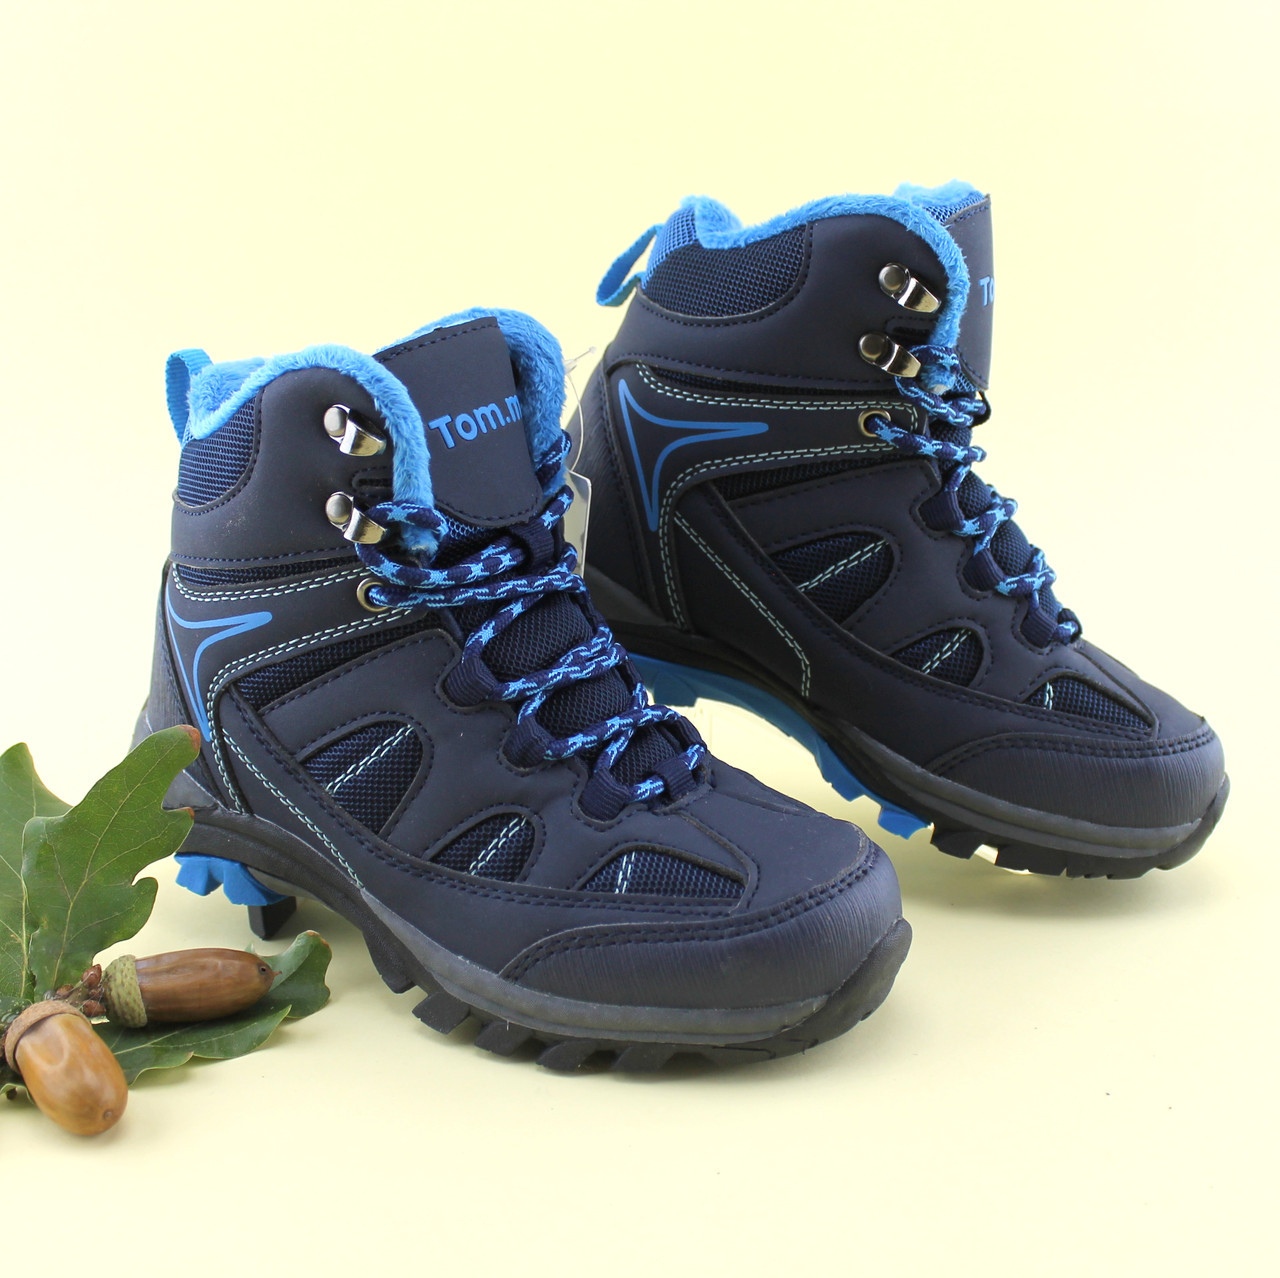 Детские ботинки типу Columbia  для мальчика ТМ ТомМ р. 32,37